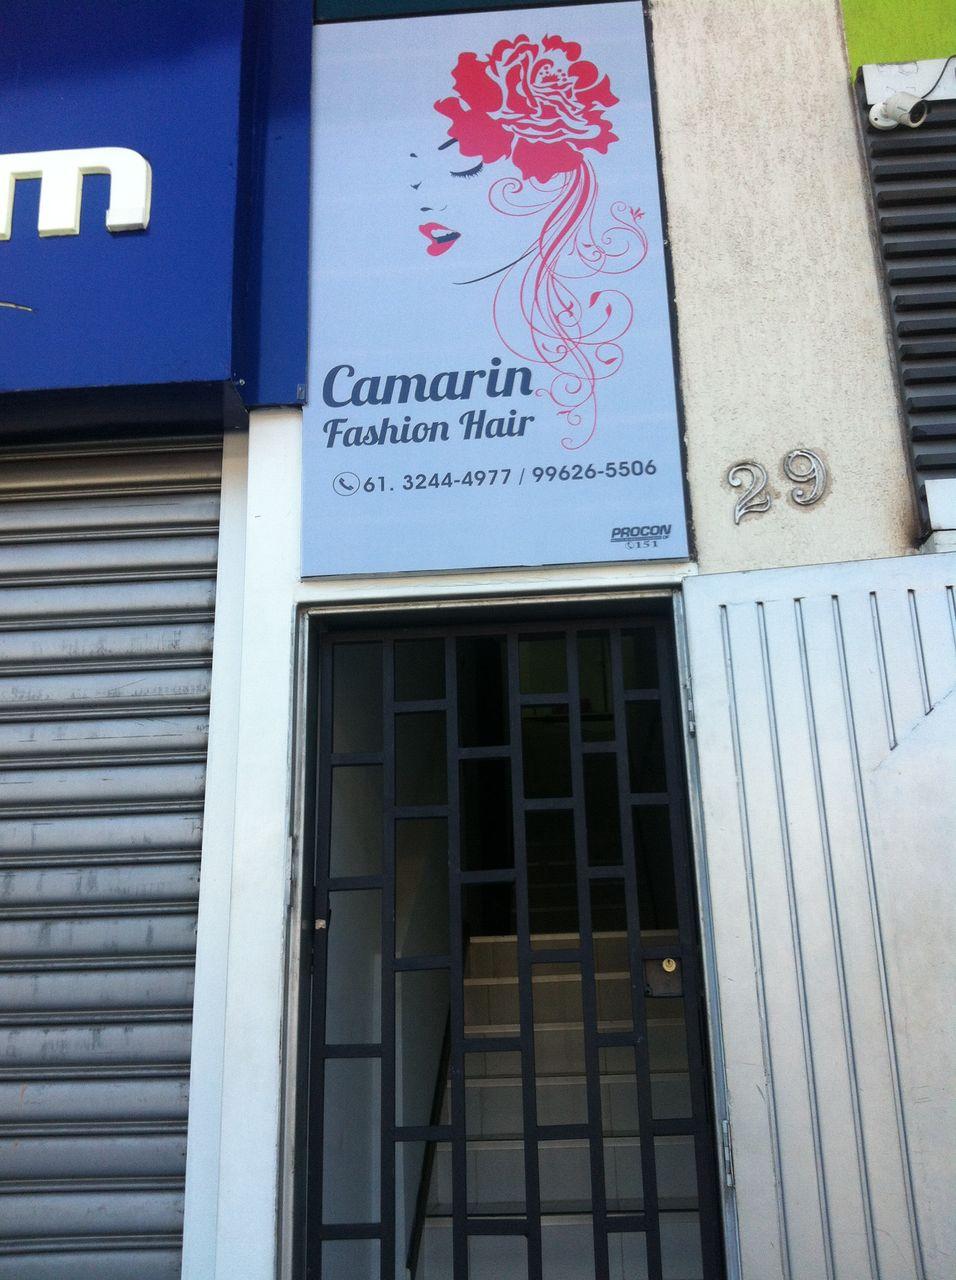 Camarim Fashion Hair, CLS 410, Bloco A, Loja 13, Asa Sul, Comércio Brasilia